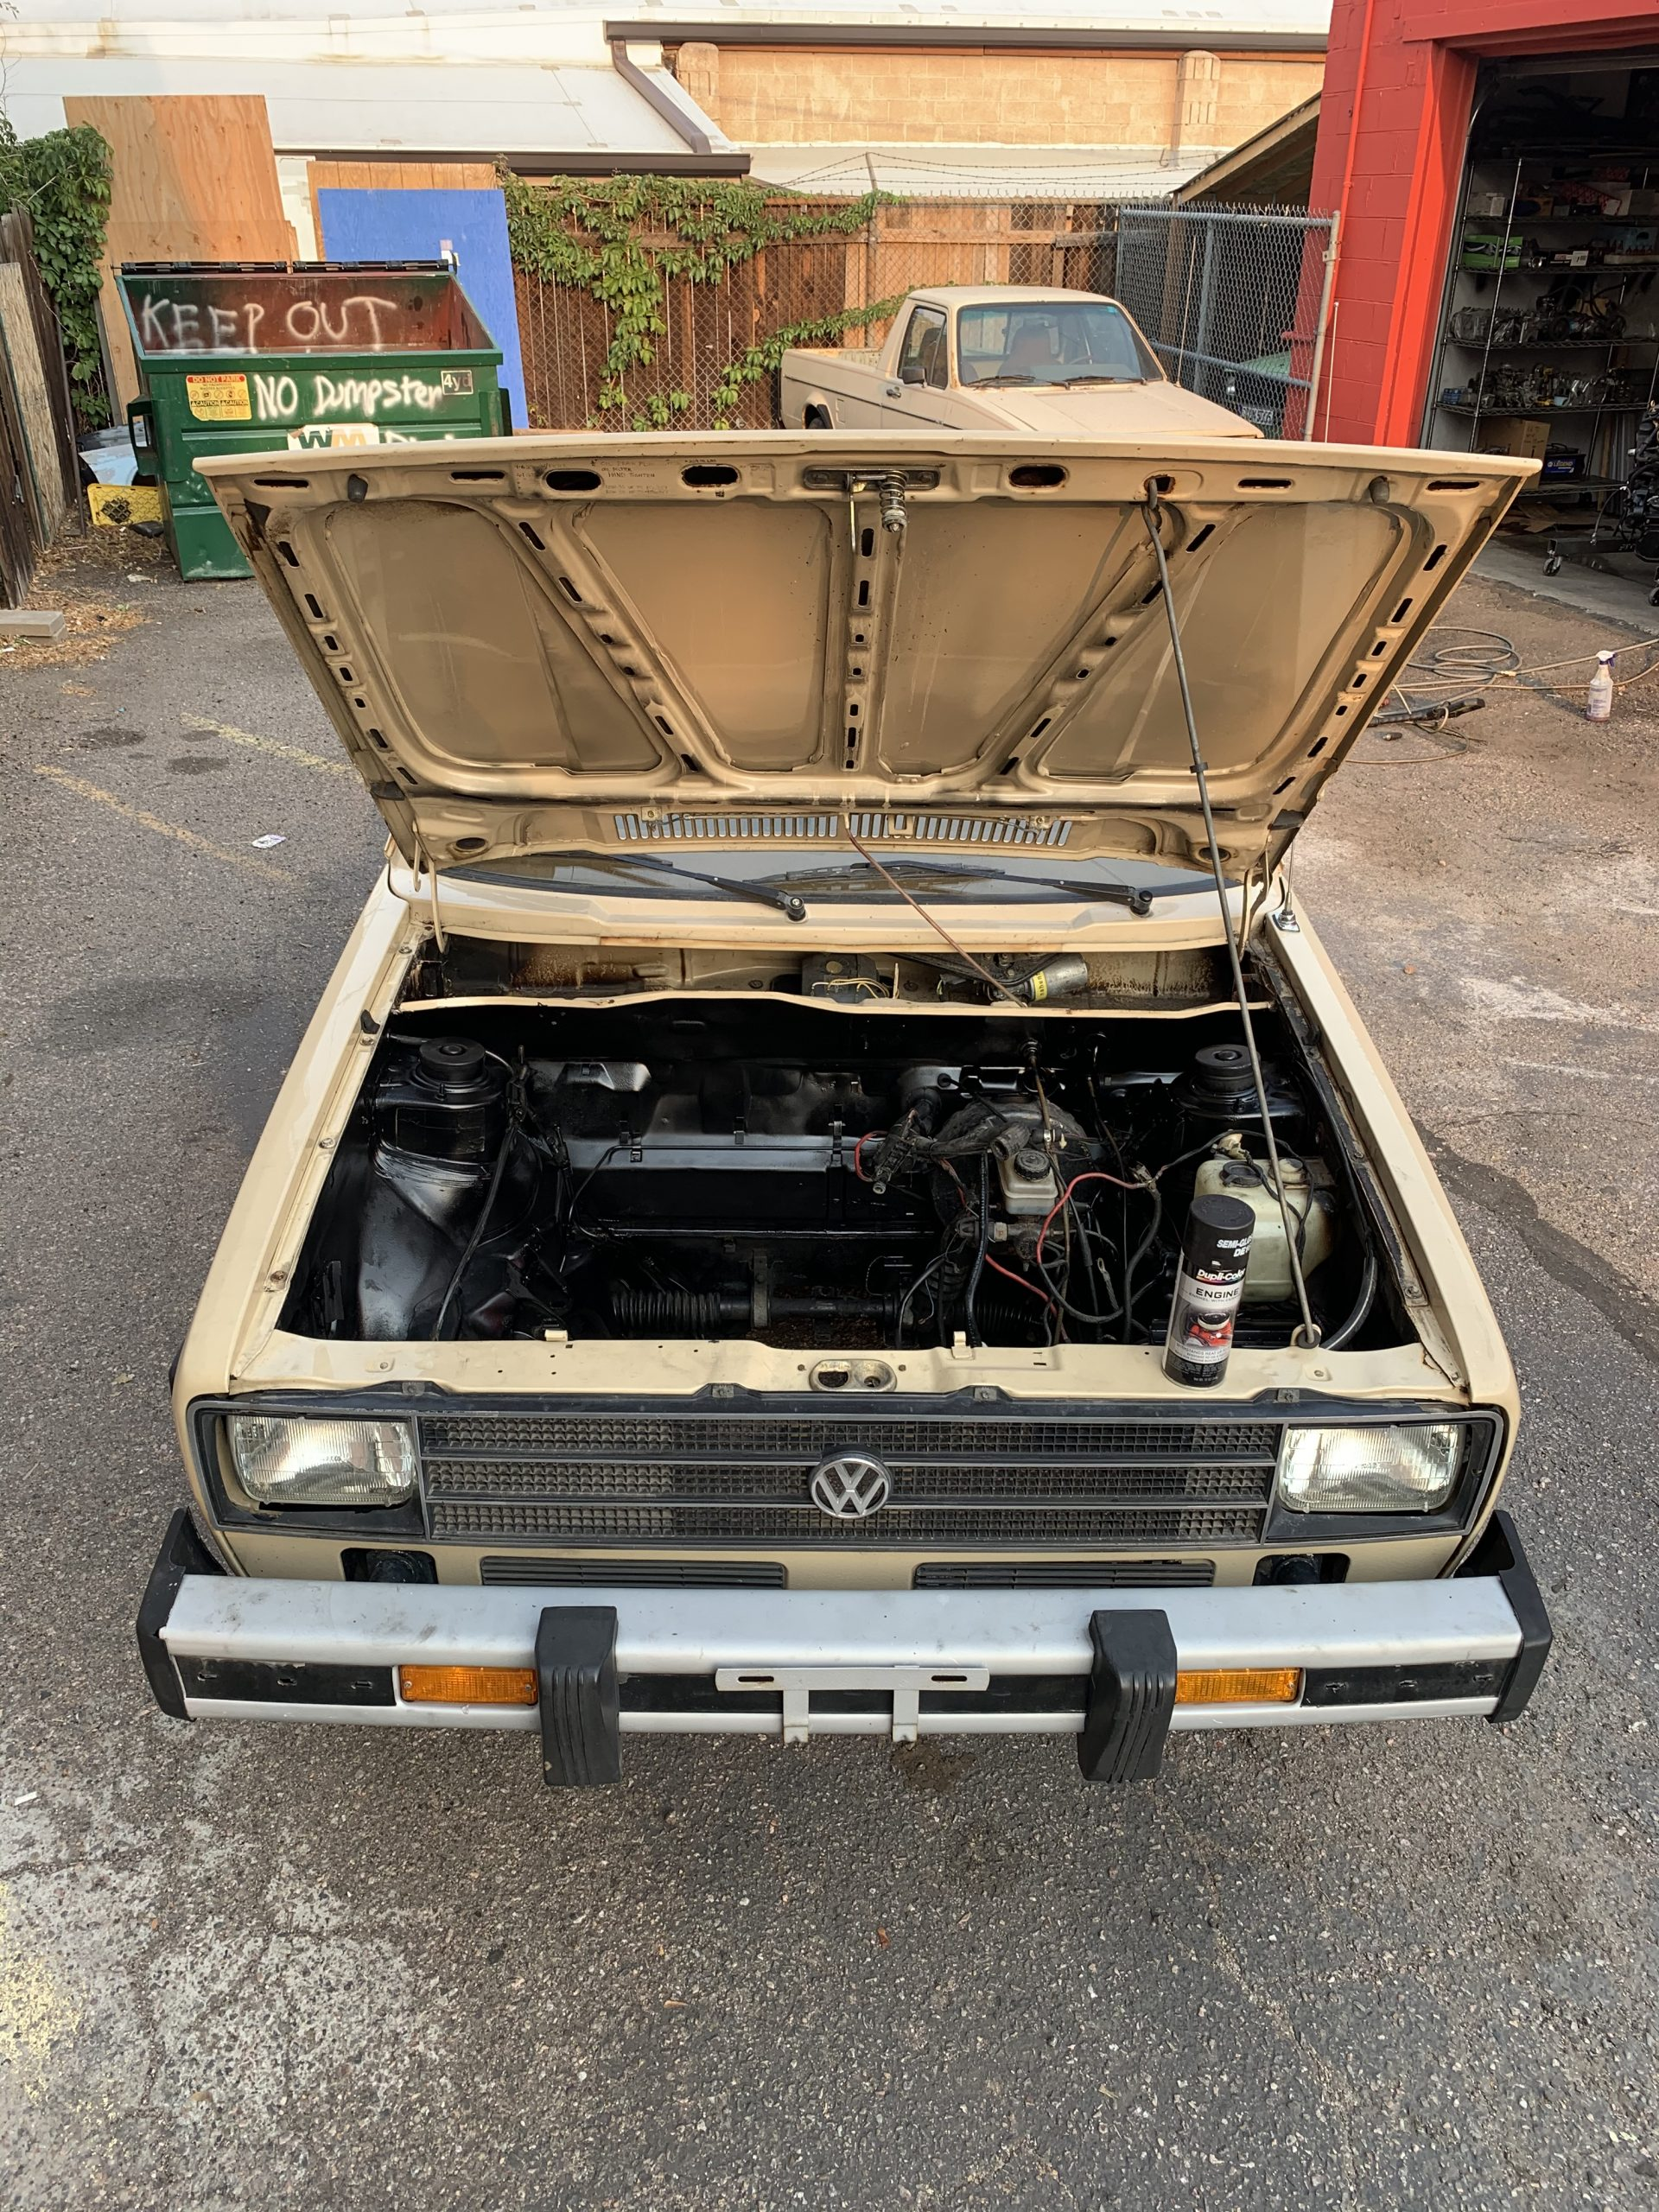 1980 VW Rabbit TDI swap engine out Aug 22, 6 29 13 PM